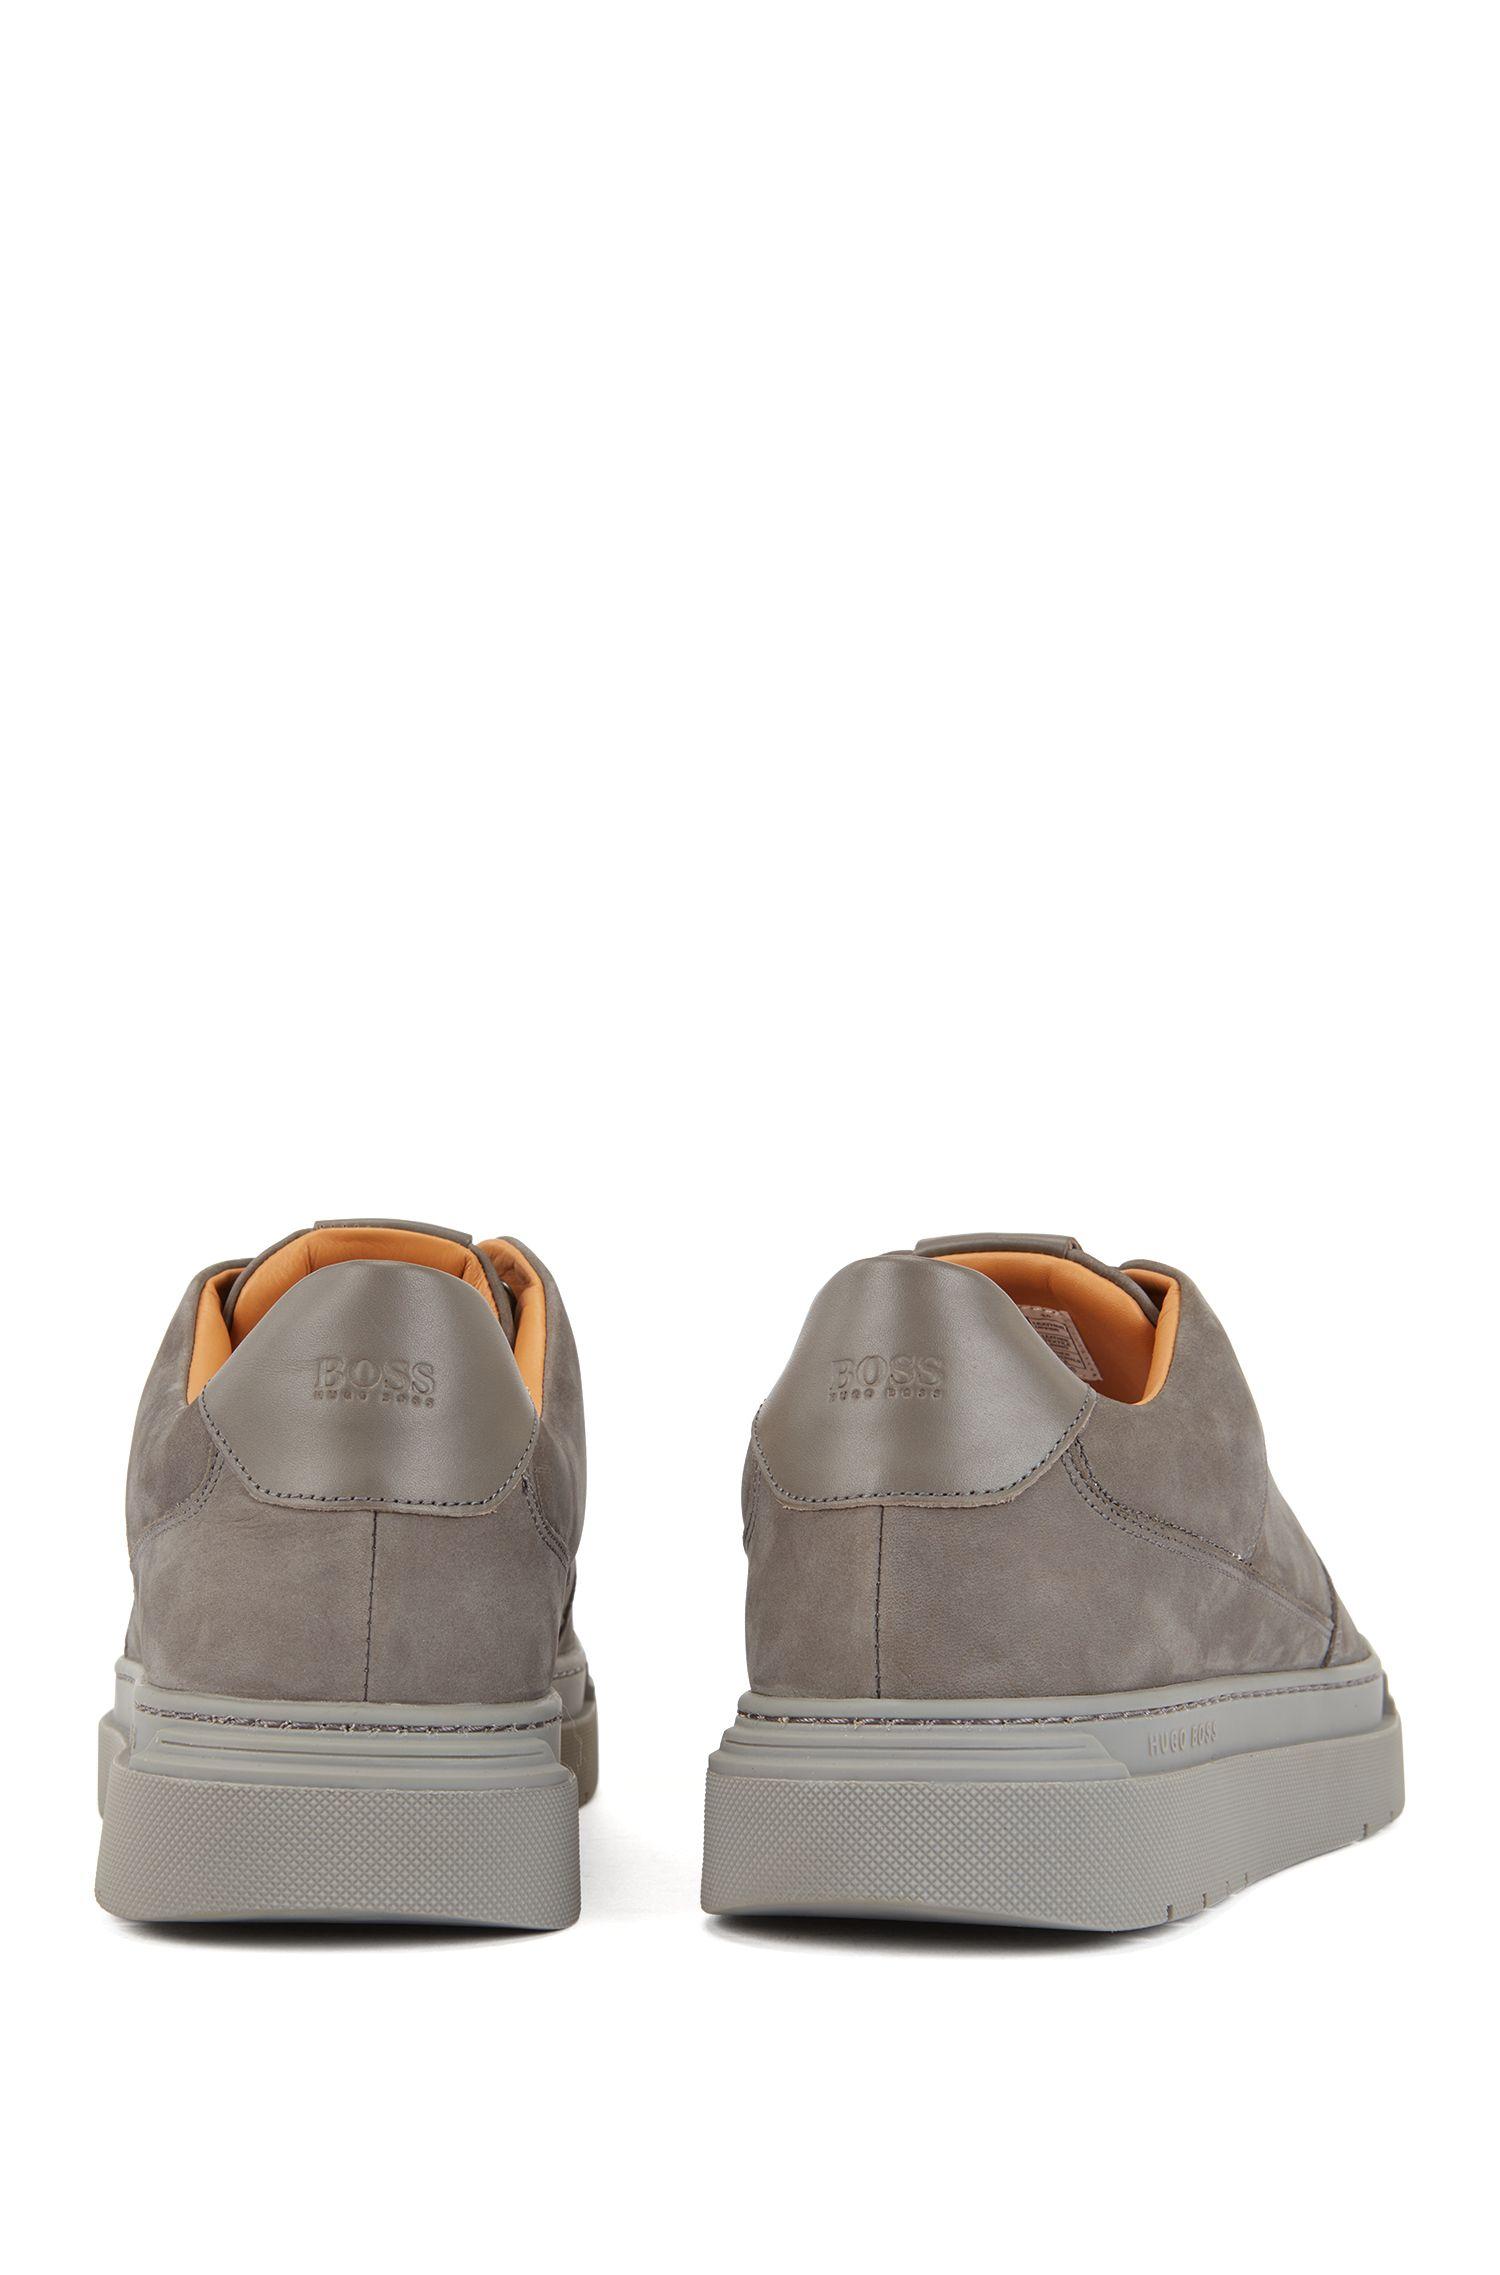 Sneakers im Tennis-Stil aus Nubukleder, Dunkelgrau